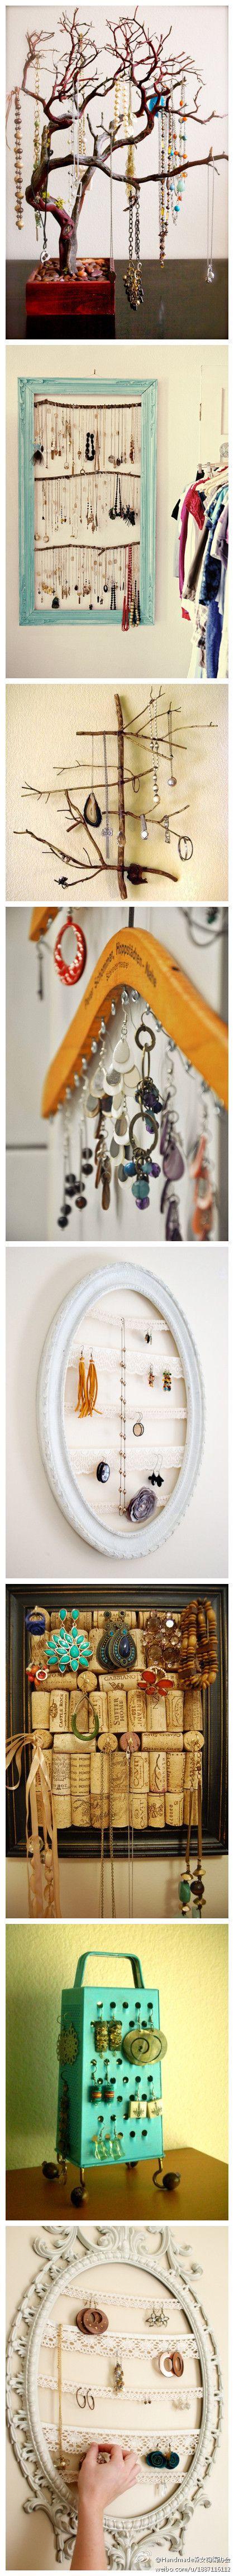 jewelry holder: Jewelry Hangers, Idea, Wine Corks, Jewelry Storage, Jewelry Stand, Jewellery Holder, Jewelry Display, Diy Jewelry Holders, Jewelry Organizations